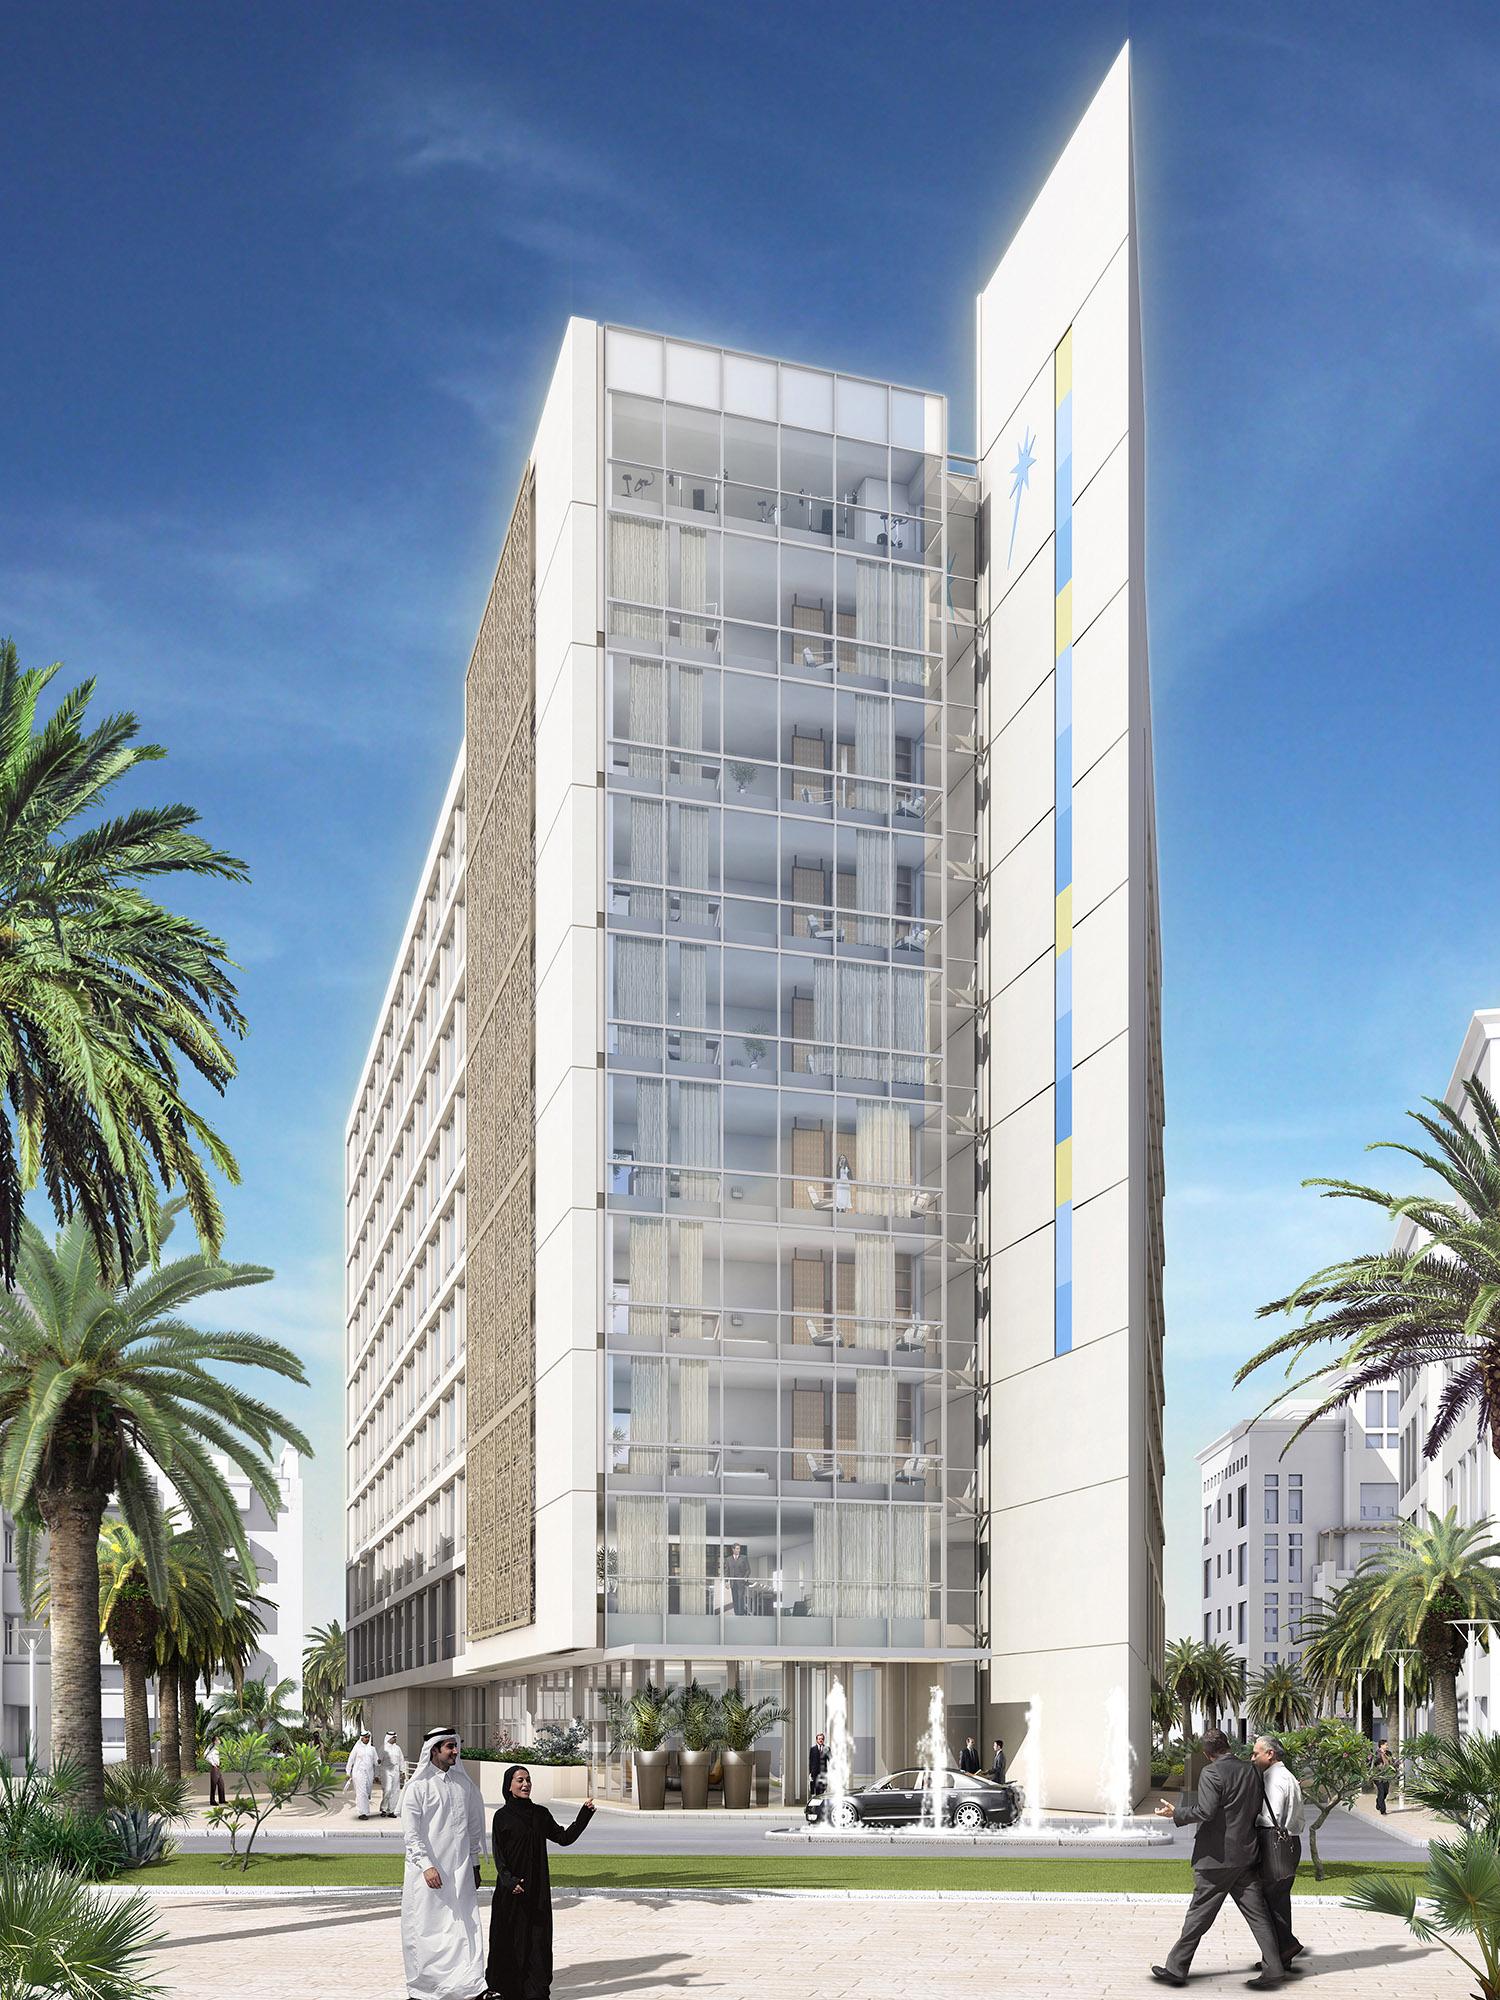 Lw design group alkhuwair hotel dubai homebase2 for Design hotel group